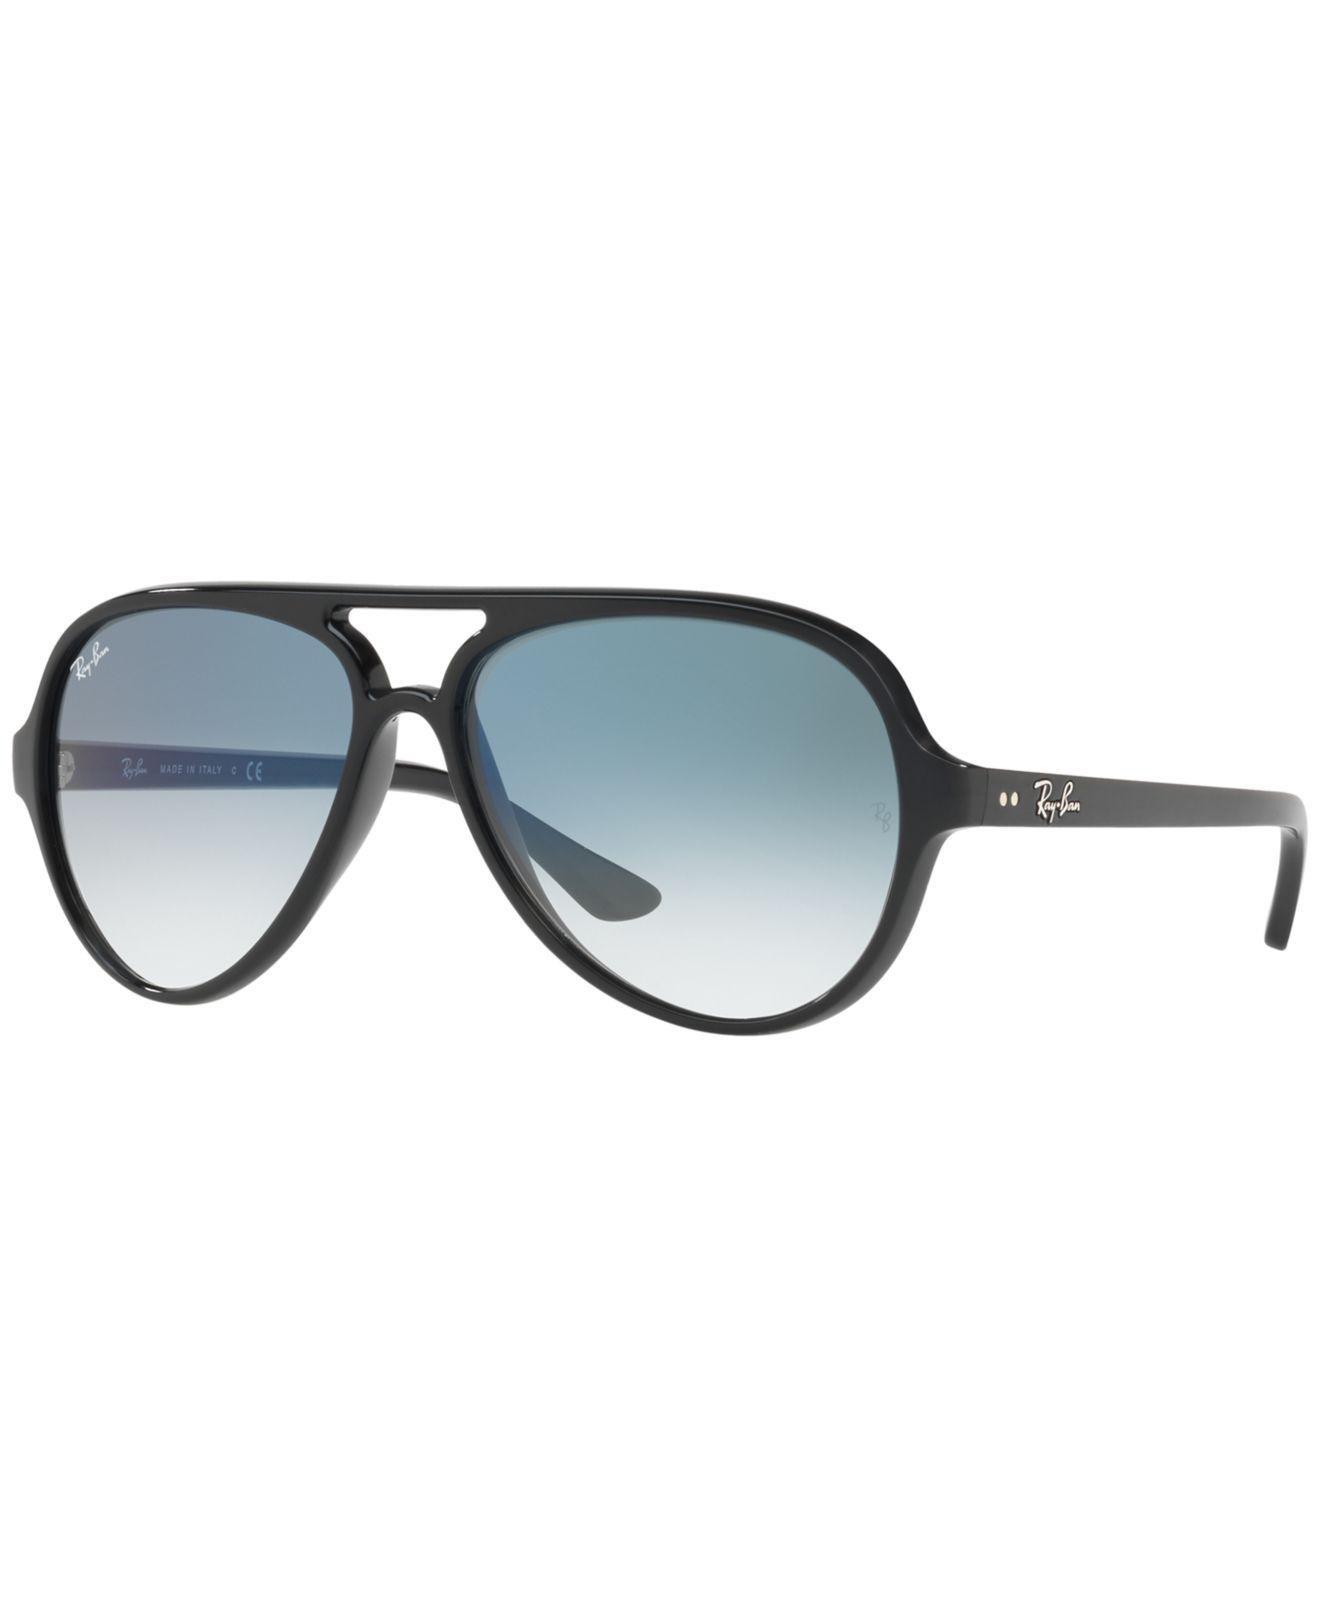 80f18a32c2f Lyst - Ray-Ban Cats 5000 Sunglasses